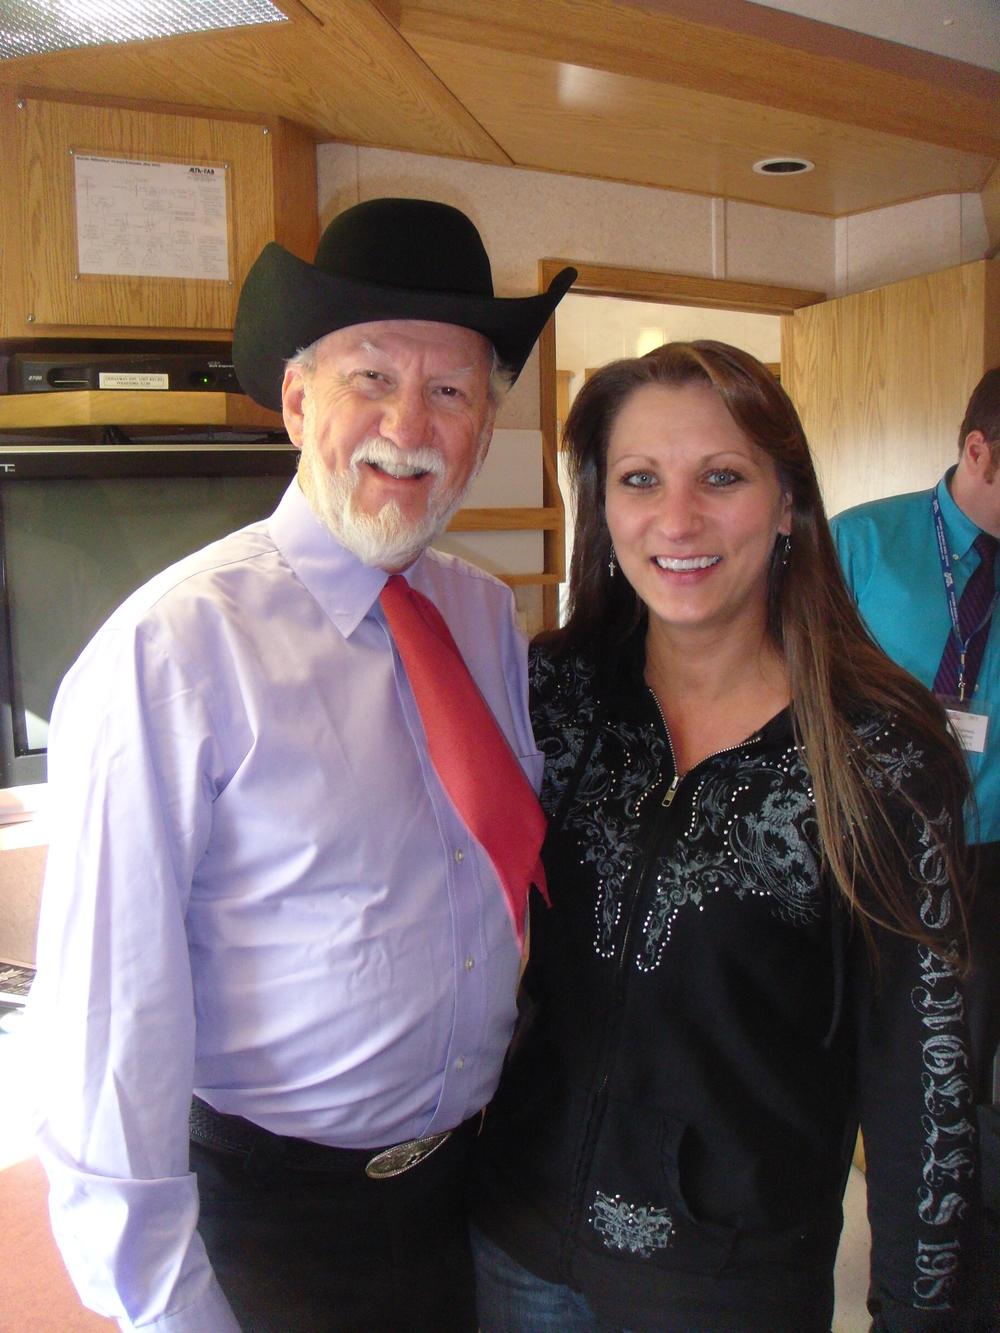 2011 - Doyle Lawson & Cindy Lennon